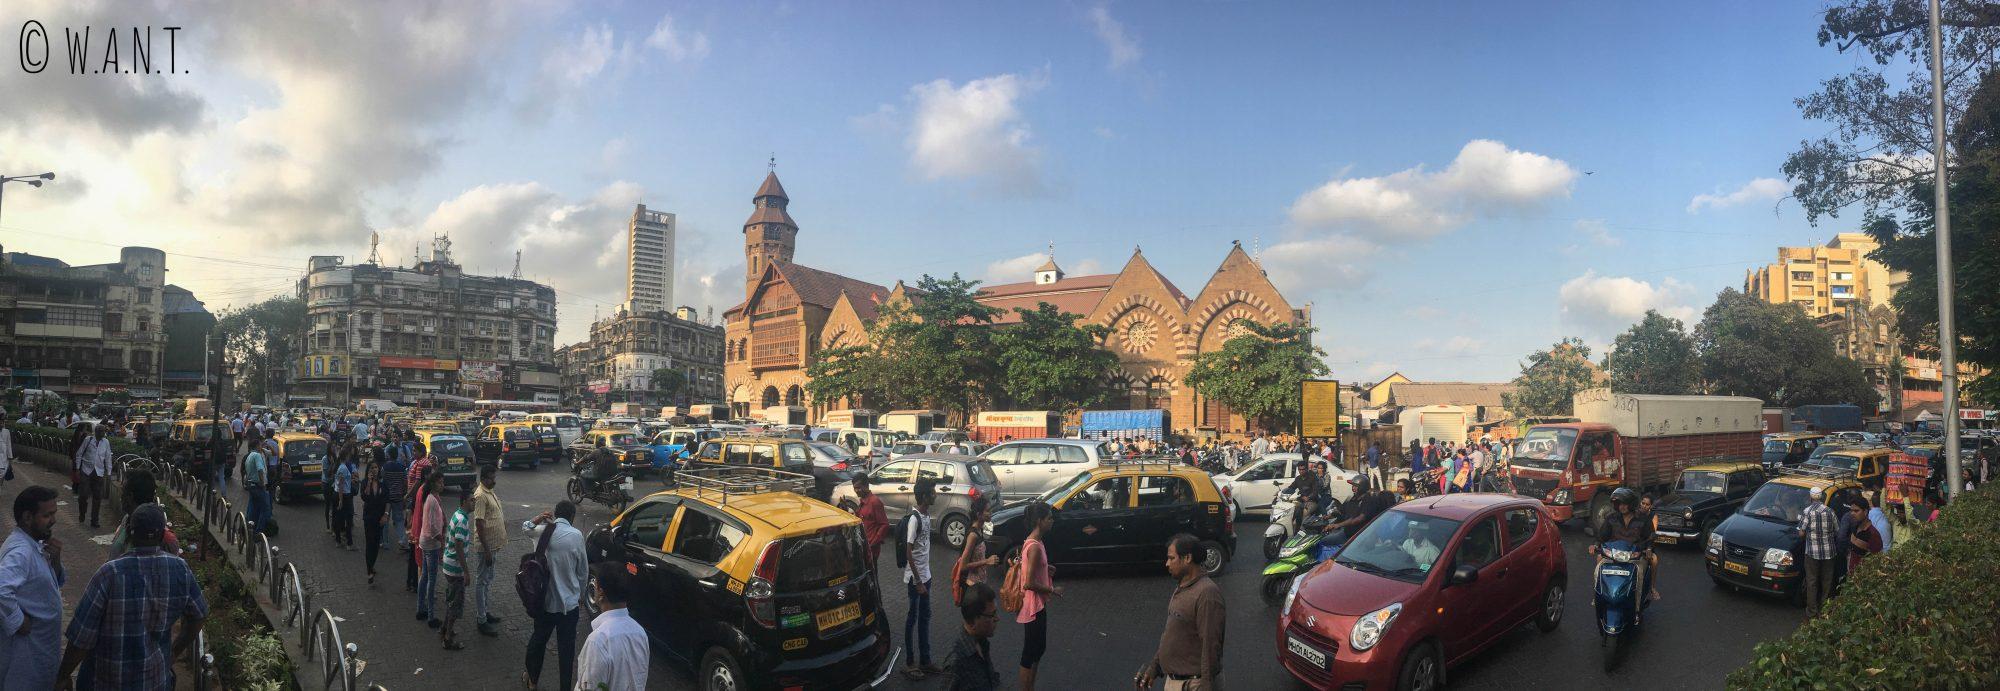 Panorama de Crawford market